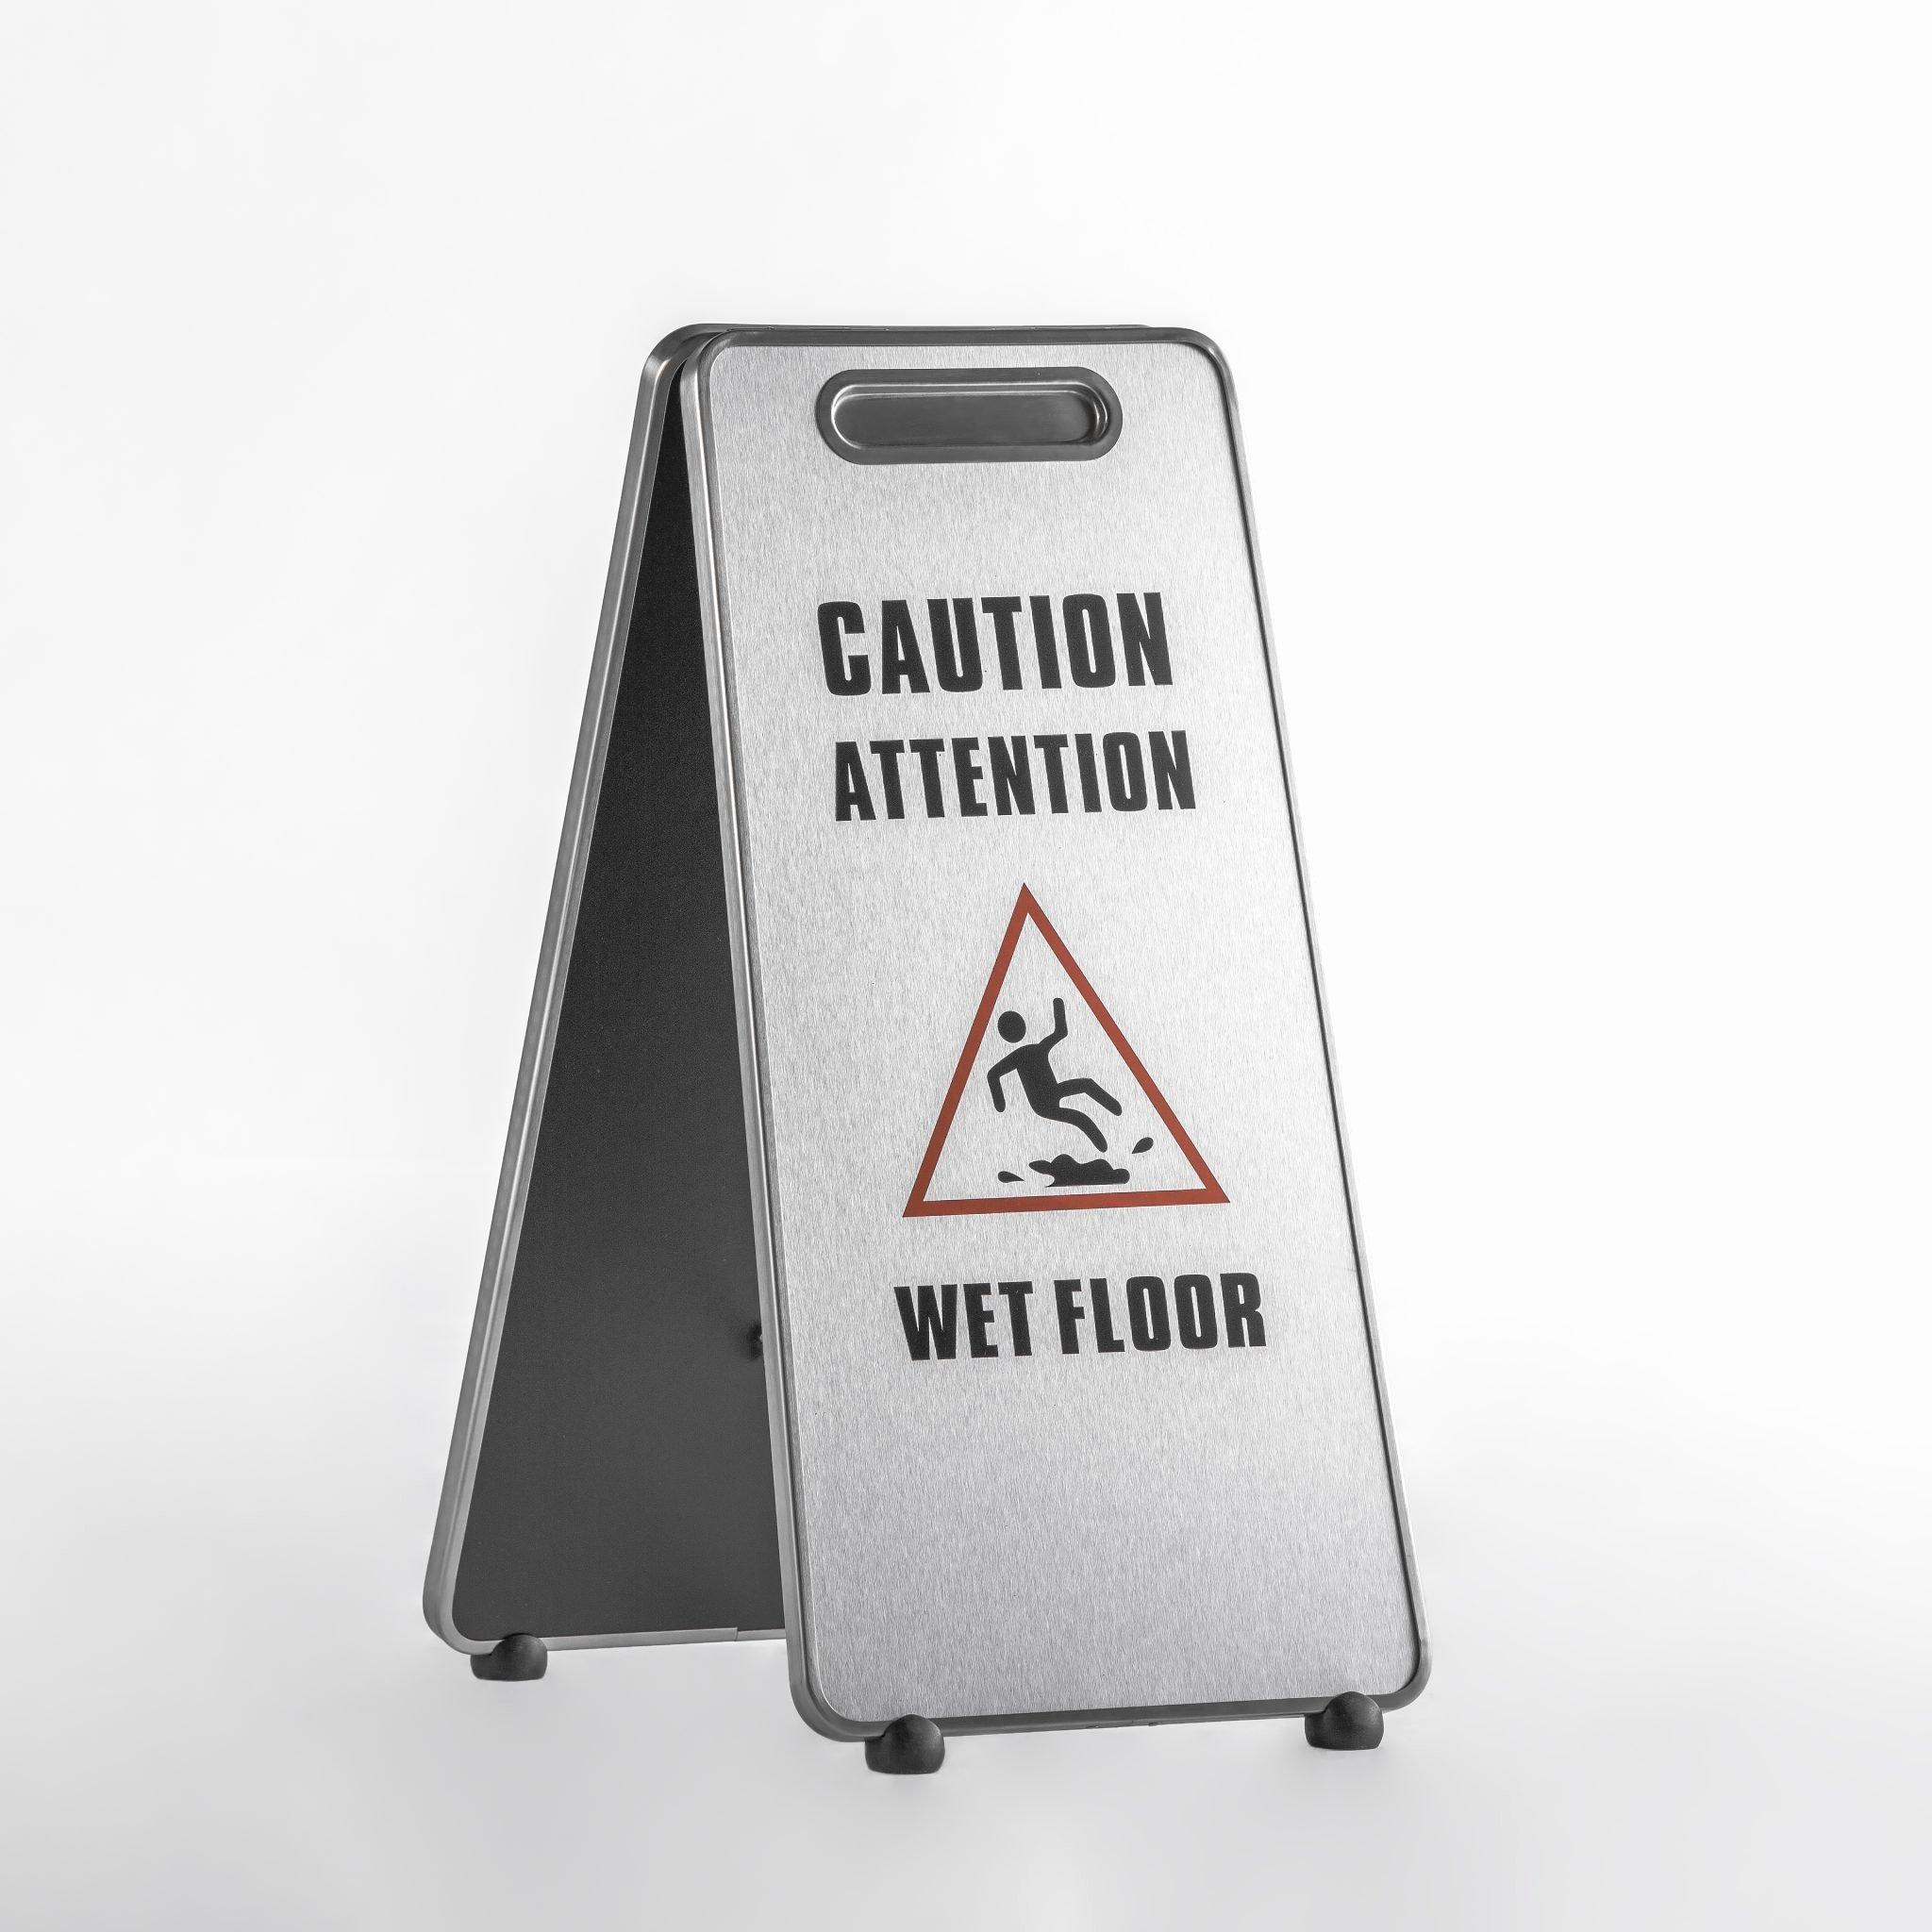 Wet Floor Signs Printable Unique Aluminum Caution Wet Floor Sign Caf 508 – Canaan